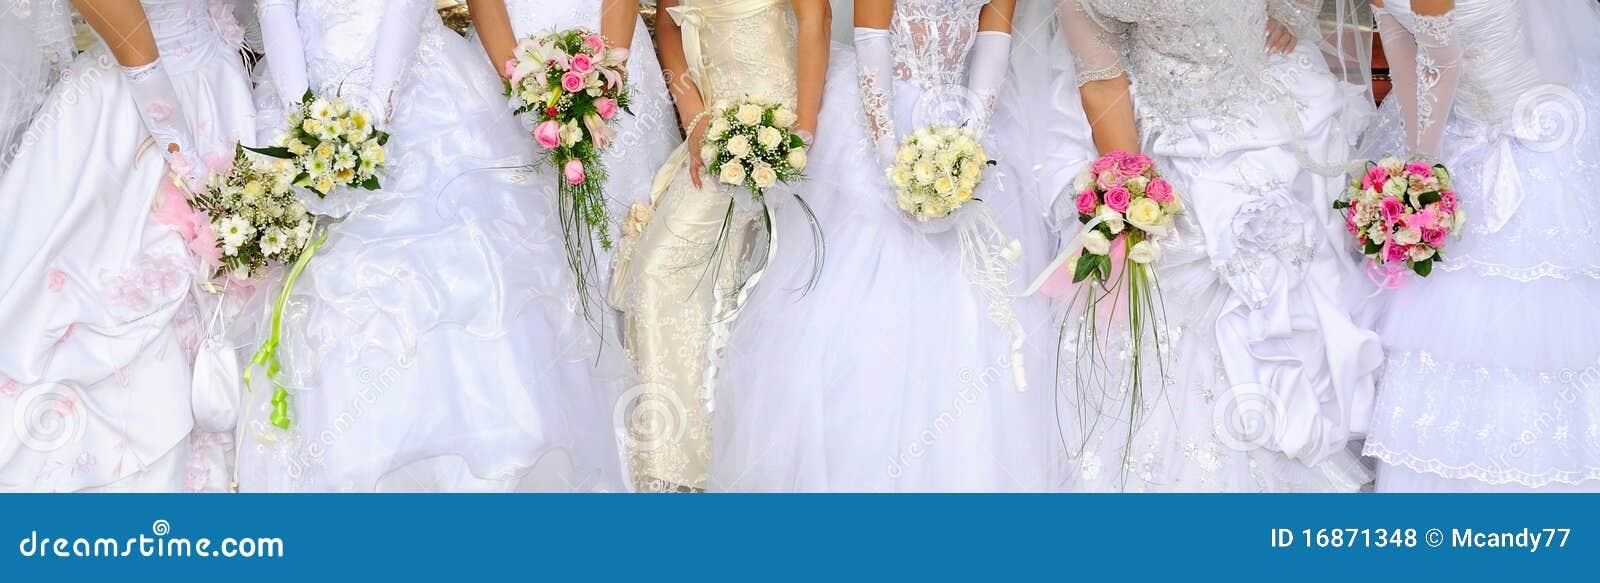 Brides hold bouquets